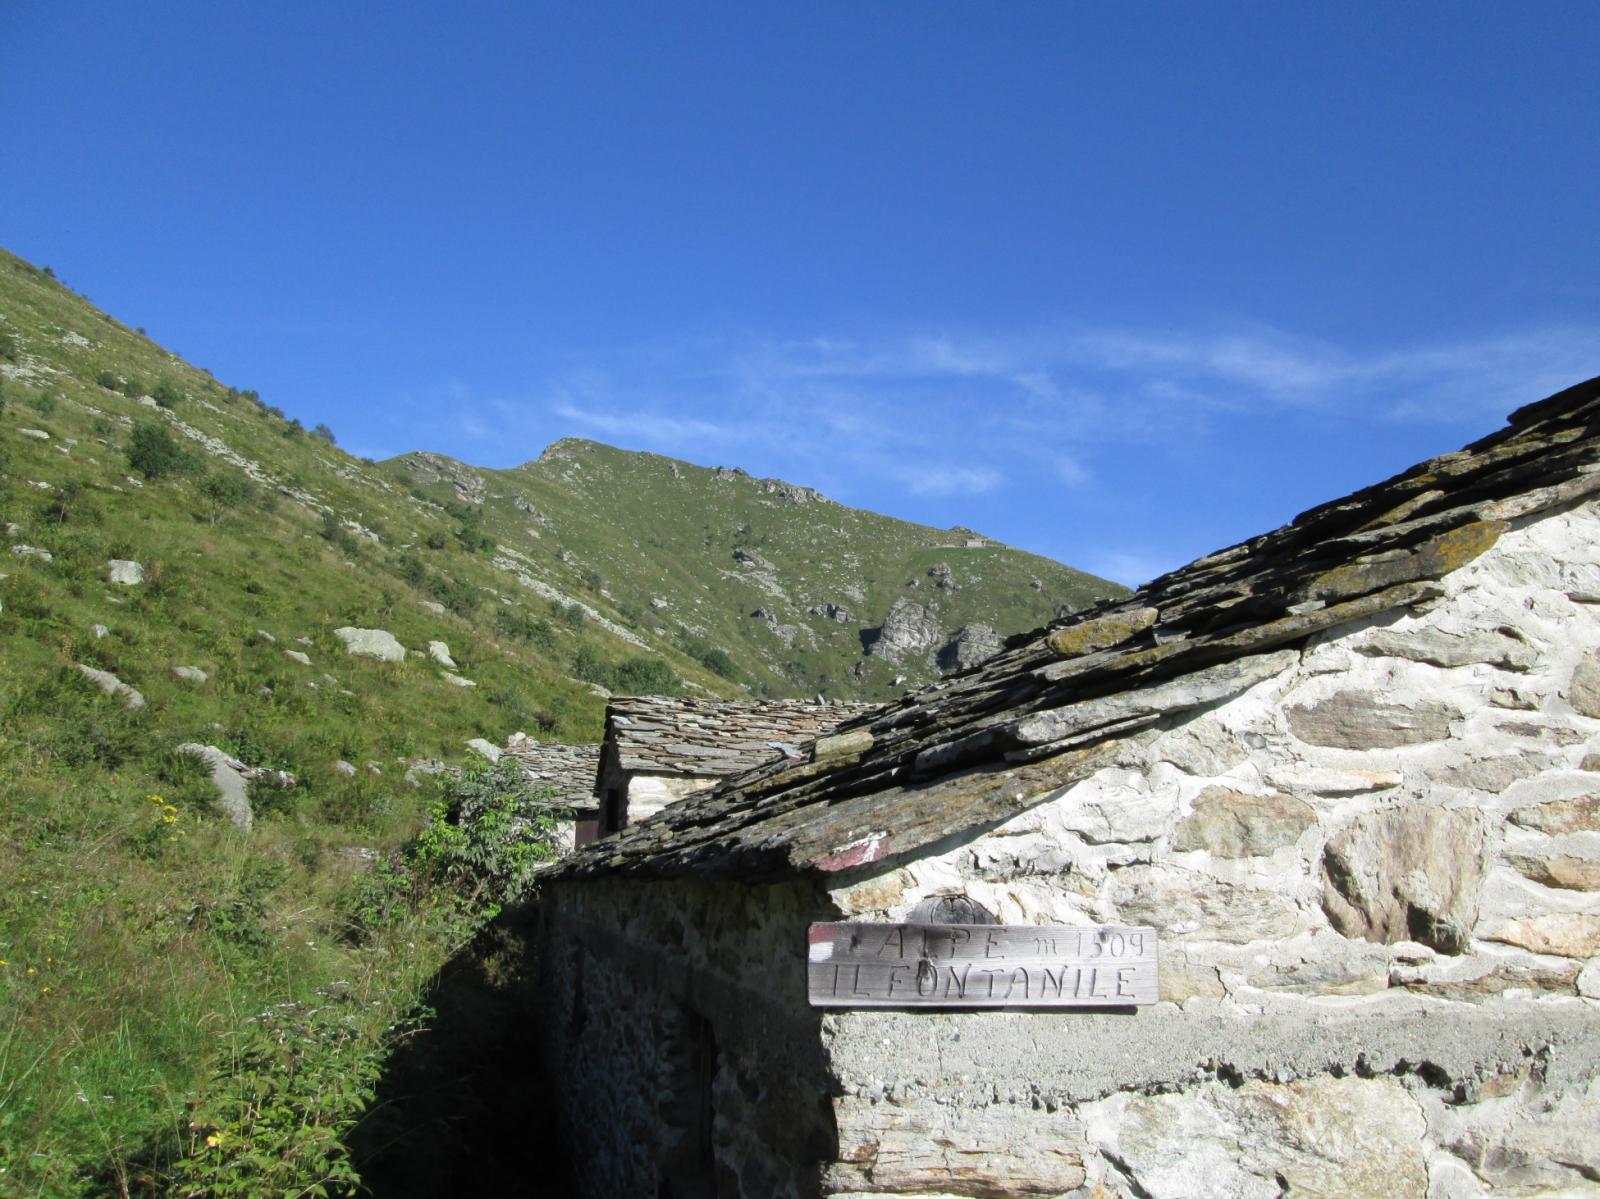 arrivo all' Alpe Fontanile